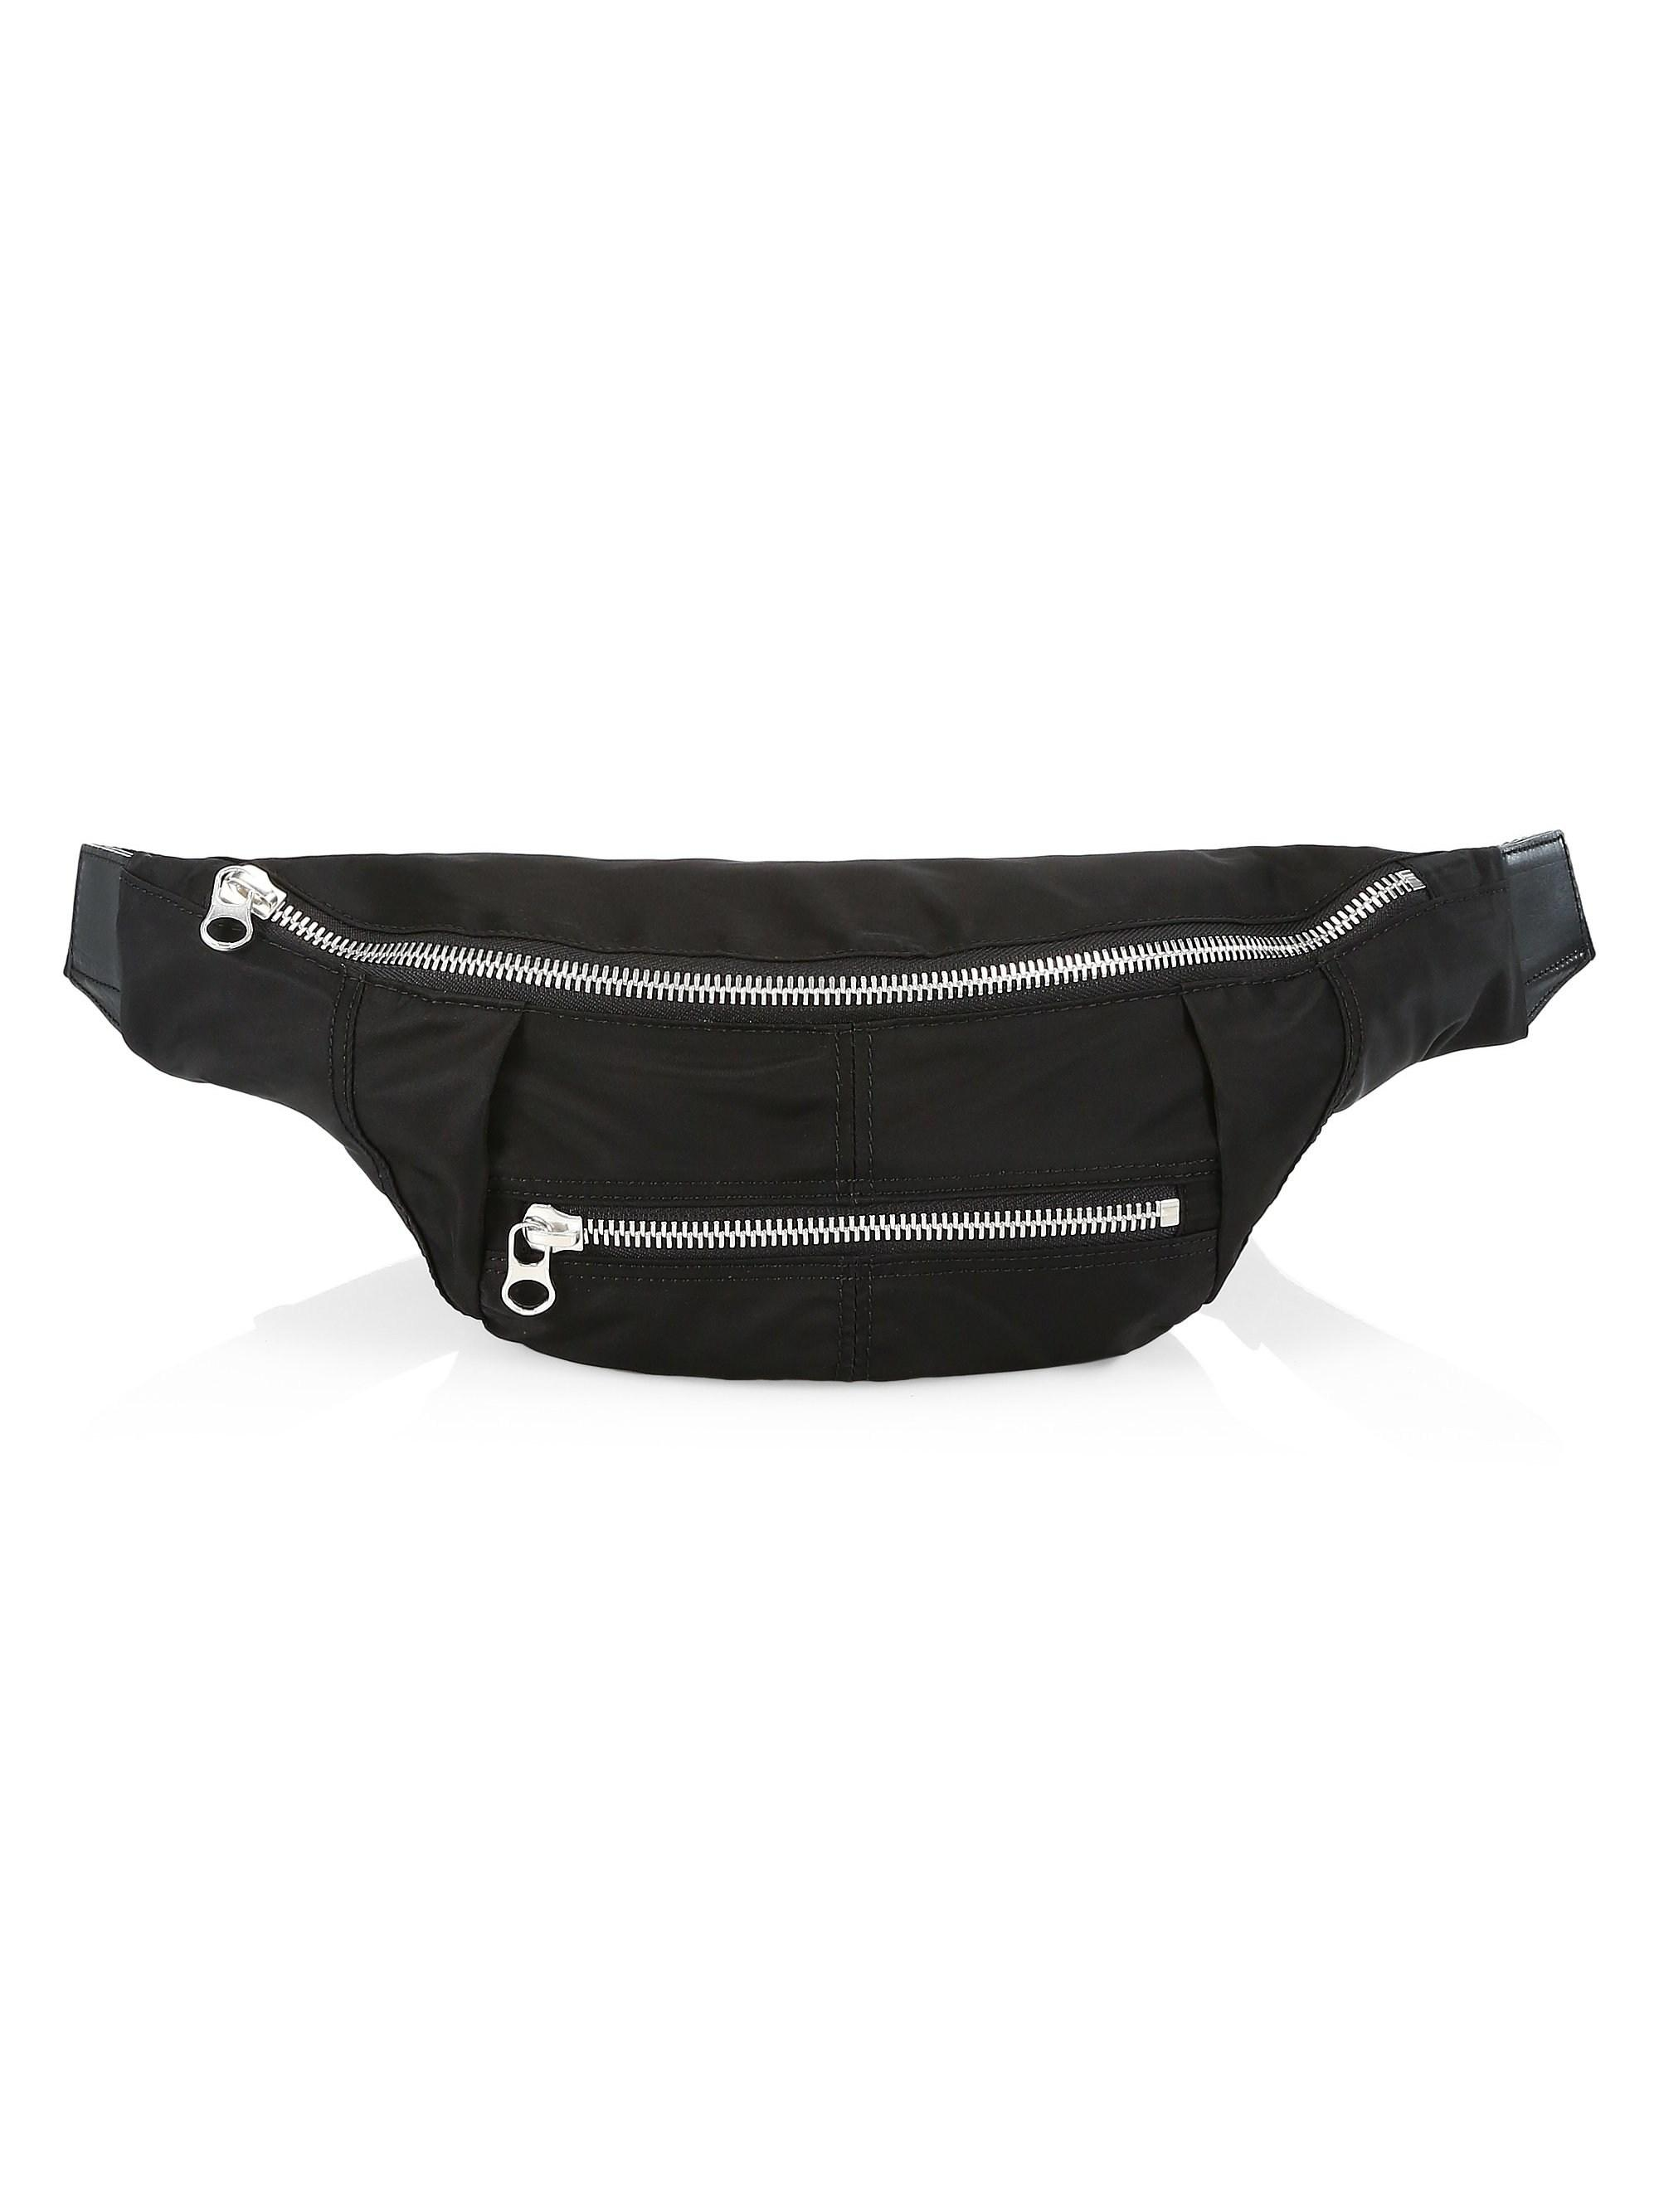 3d55abb5f12e54 Isabel Marant Nylon Belt Bag in Black - Save 30% - Lyst